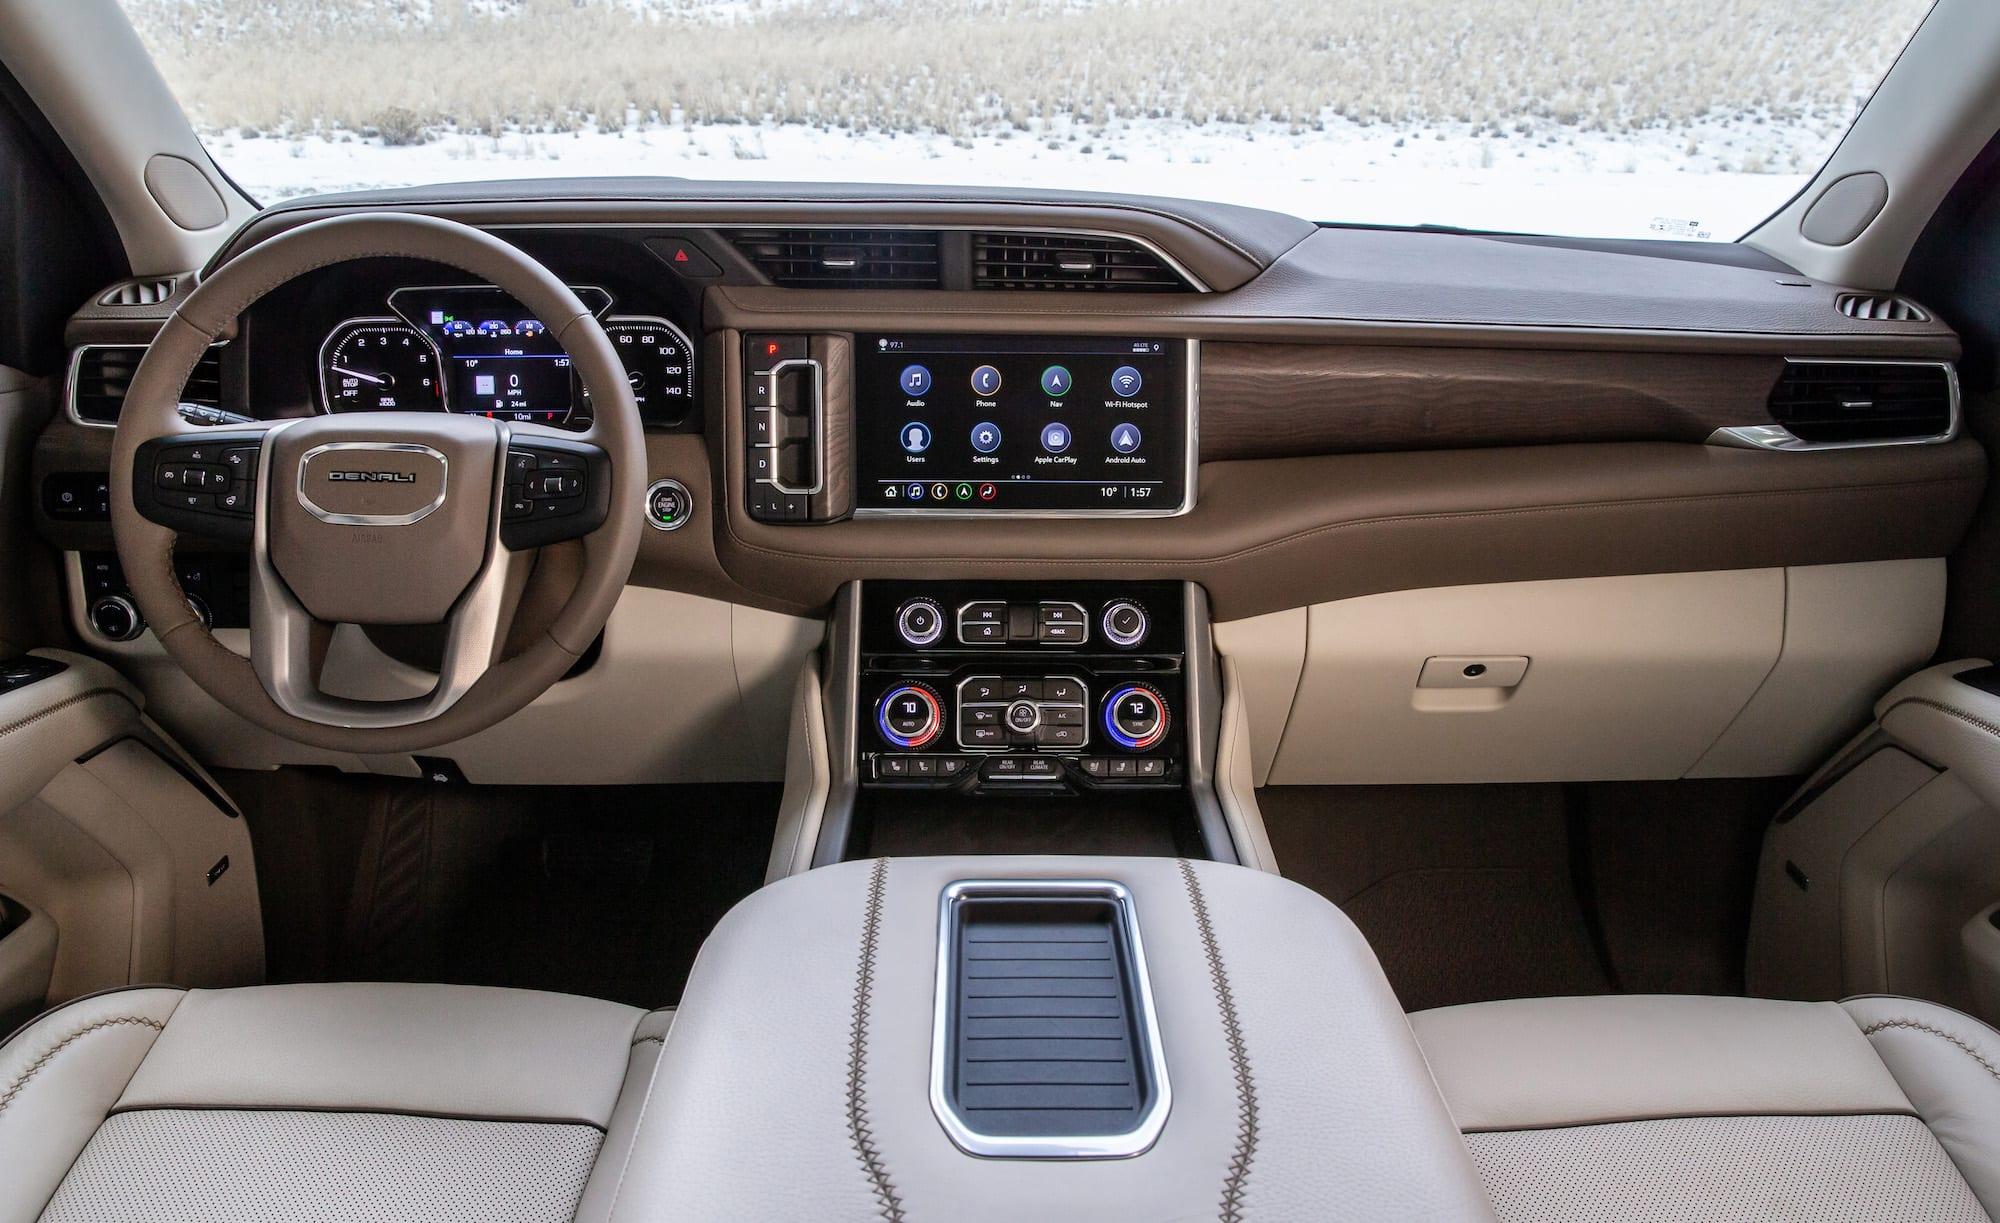 2021 GMC Yukon Denali interiors